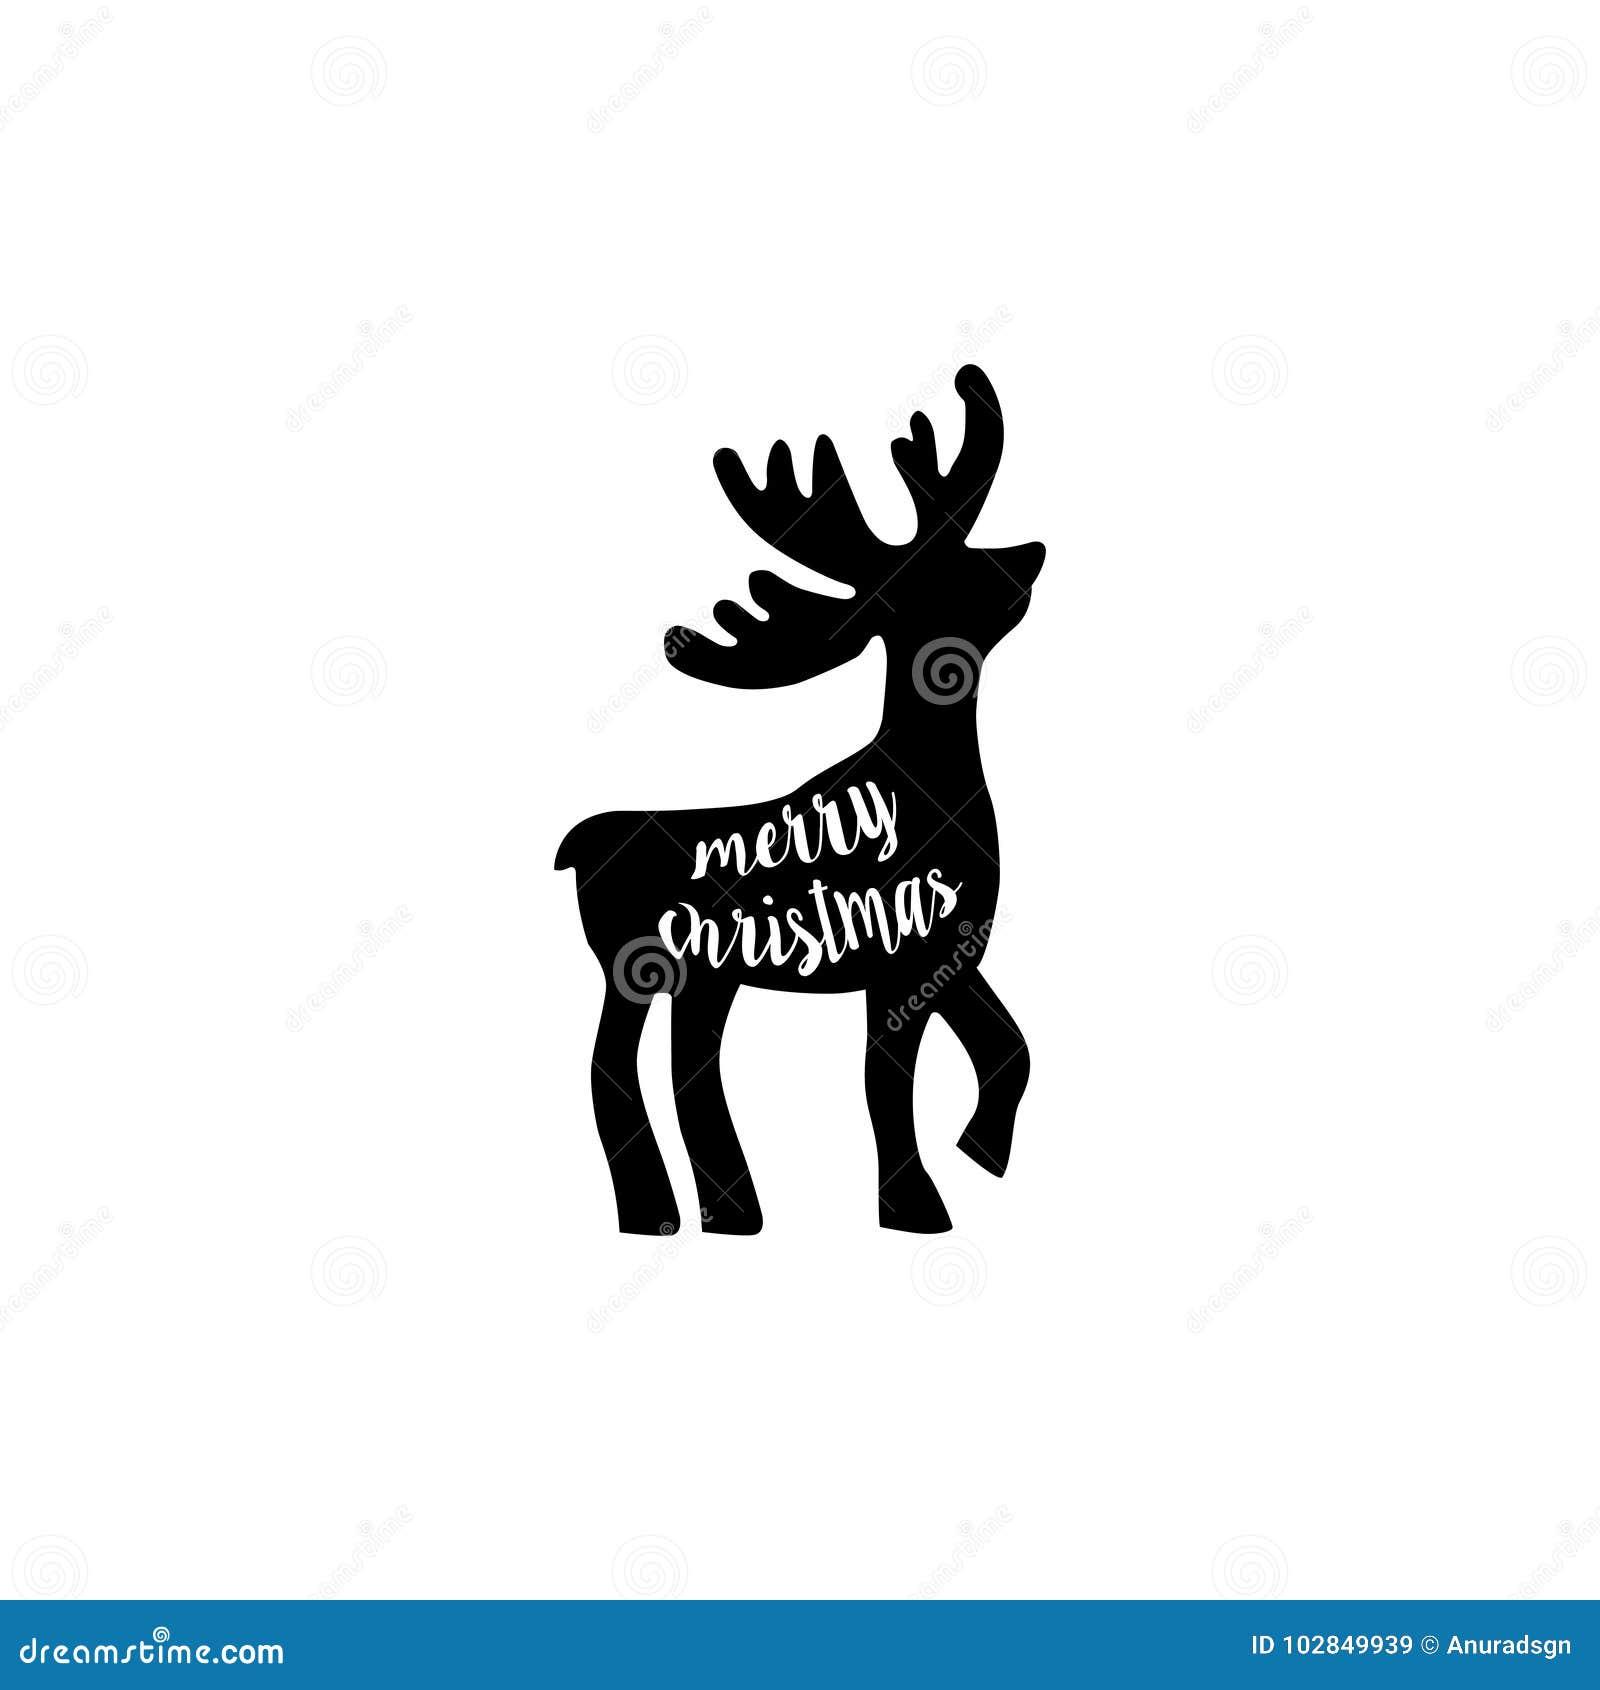 Christmas Reindeer Silhouette.Reindeer Silhouette Merry Christmas Stock Vector